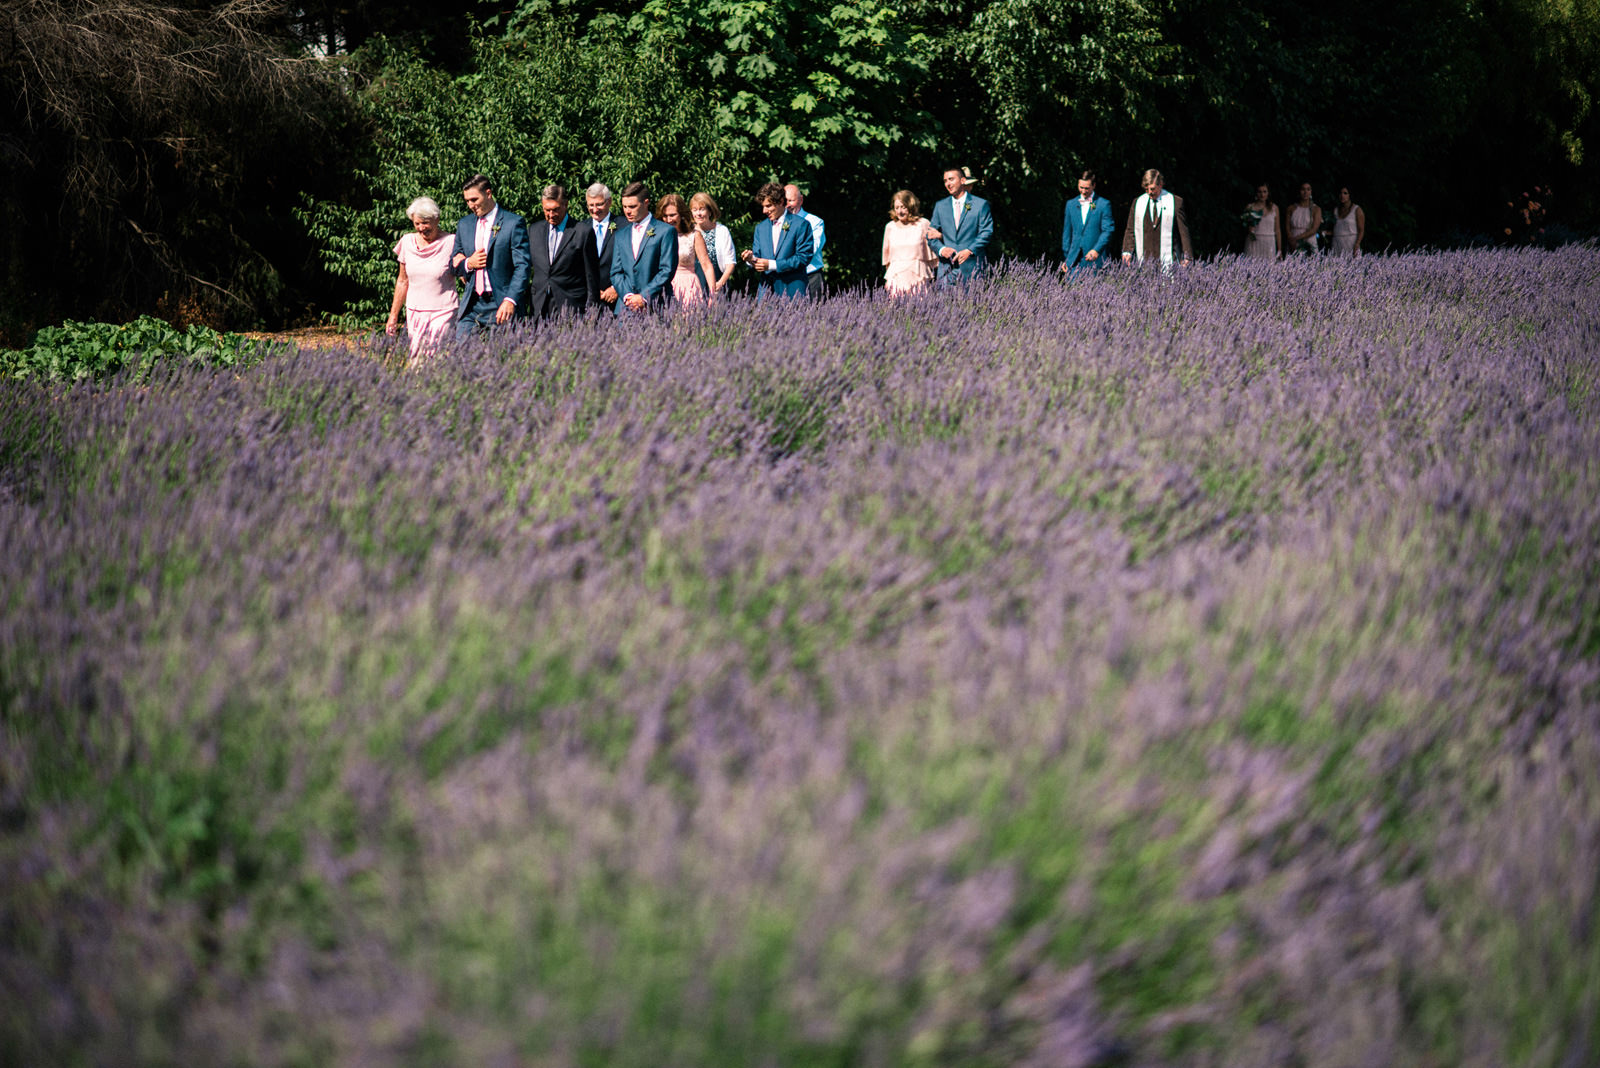 034-woodinville-lavendar-farm-wedding-with-golden-glowy-photos.jpg